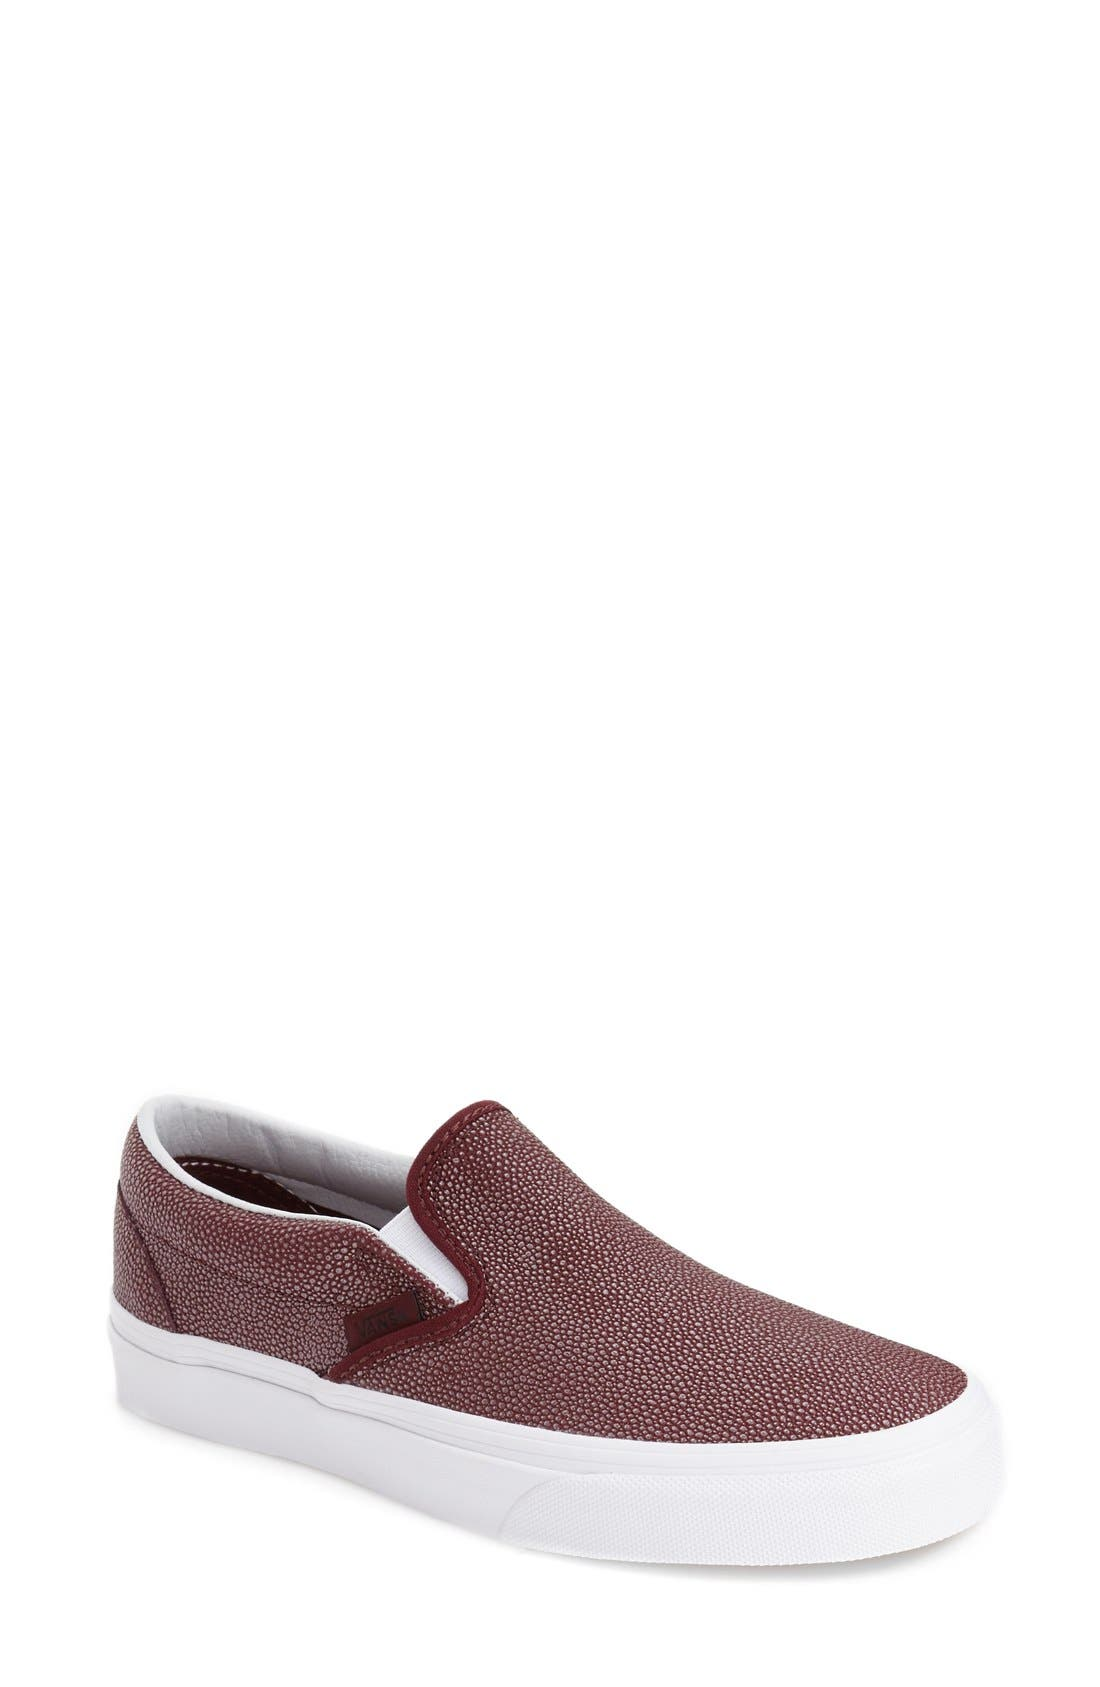 ,                             Classic Slip-On Sneaker,                             Main thumbnail 378, color,                             601